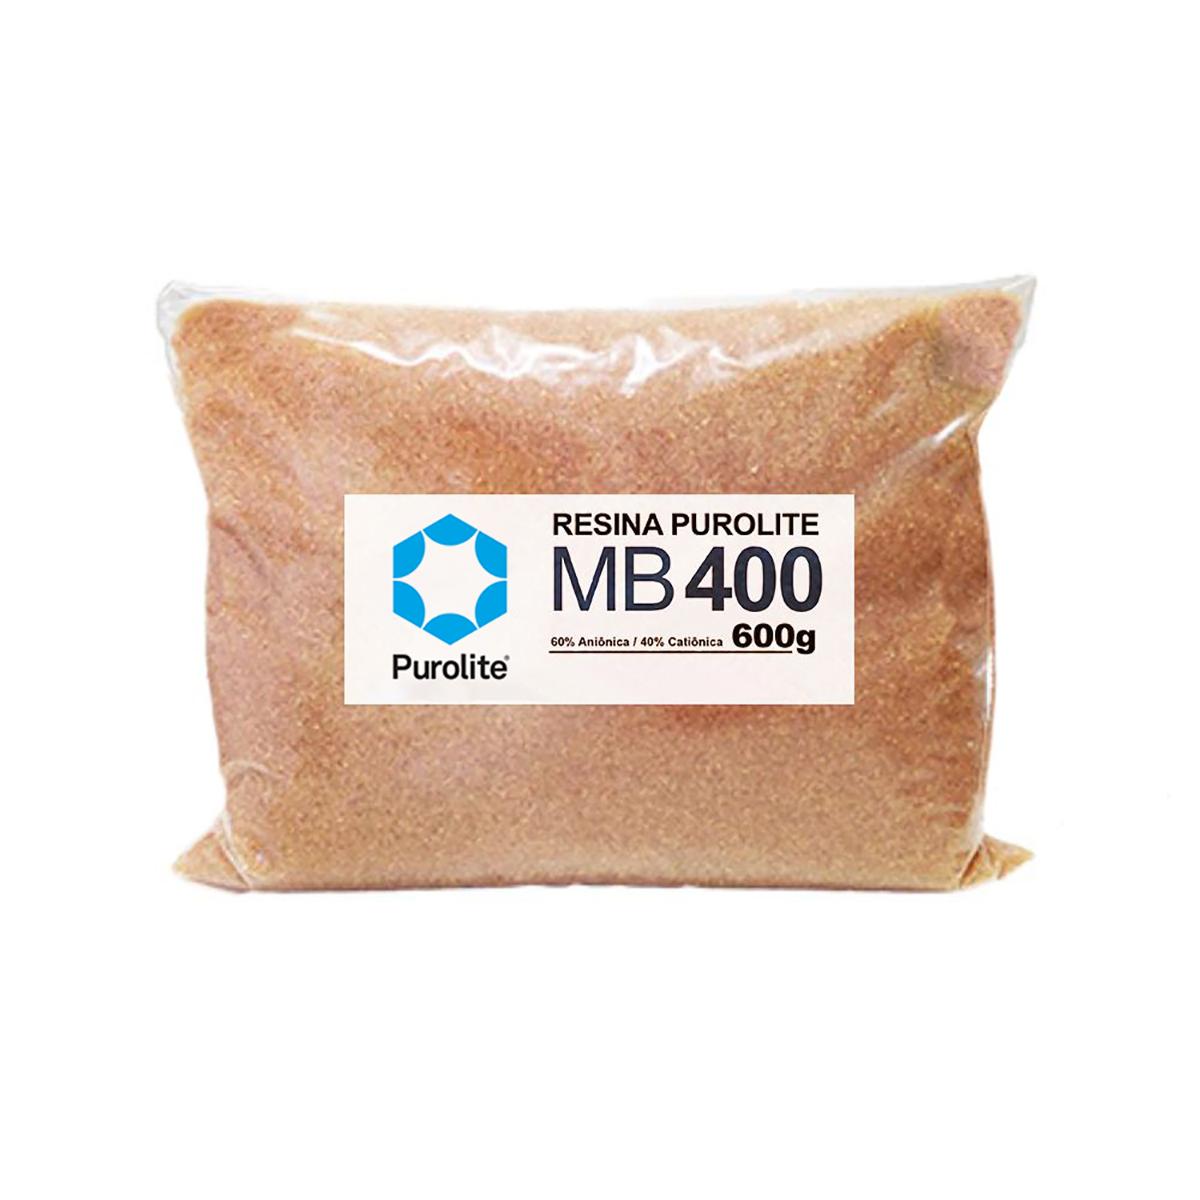 Resina Mista Purolite Mb400 Para Deionizador